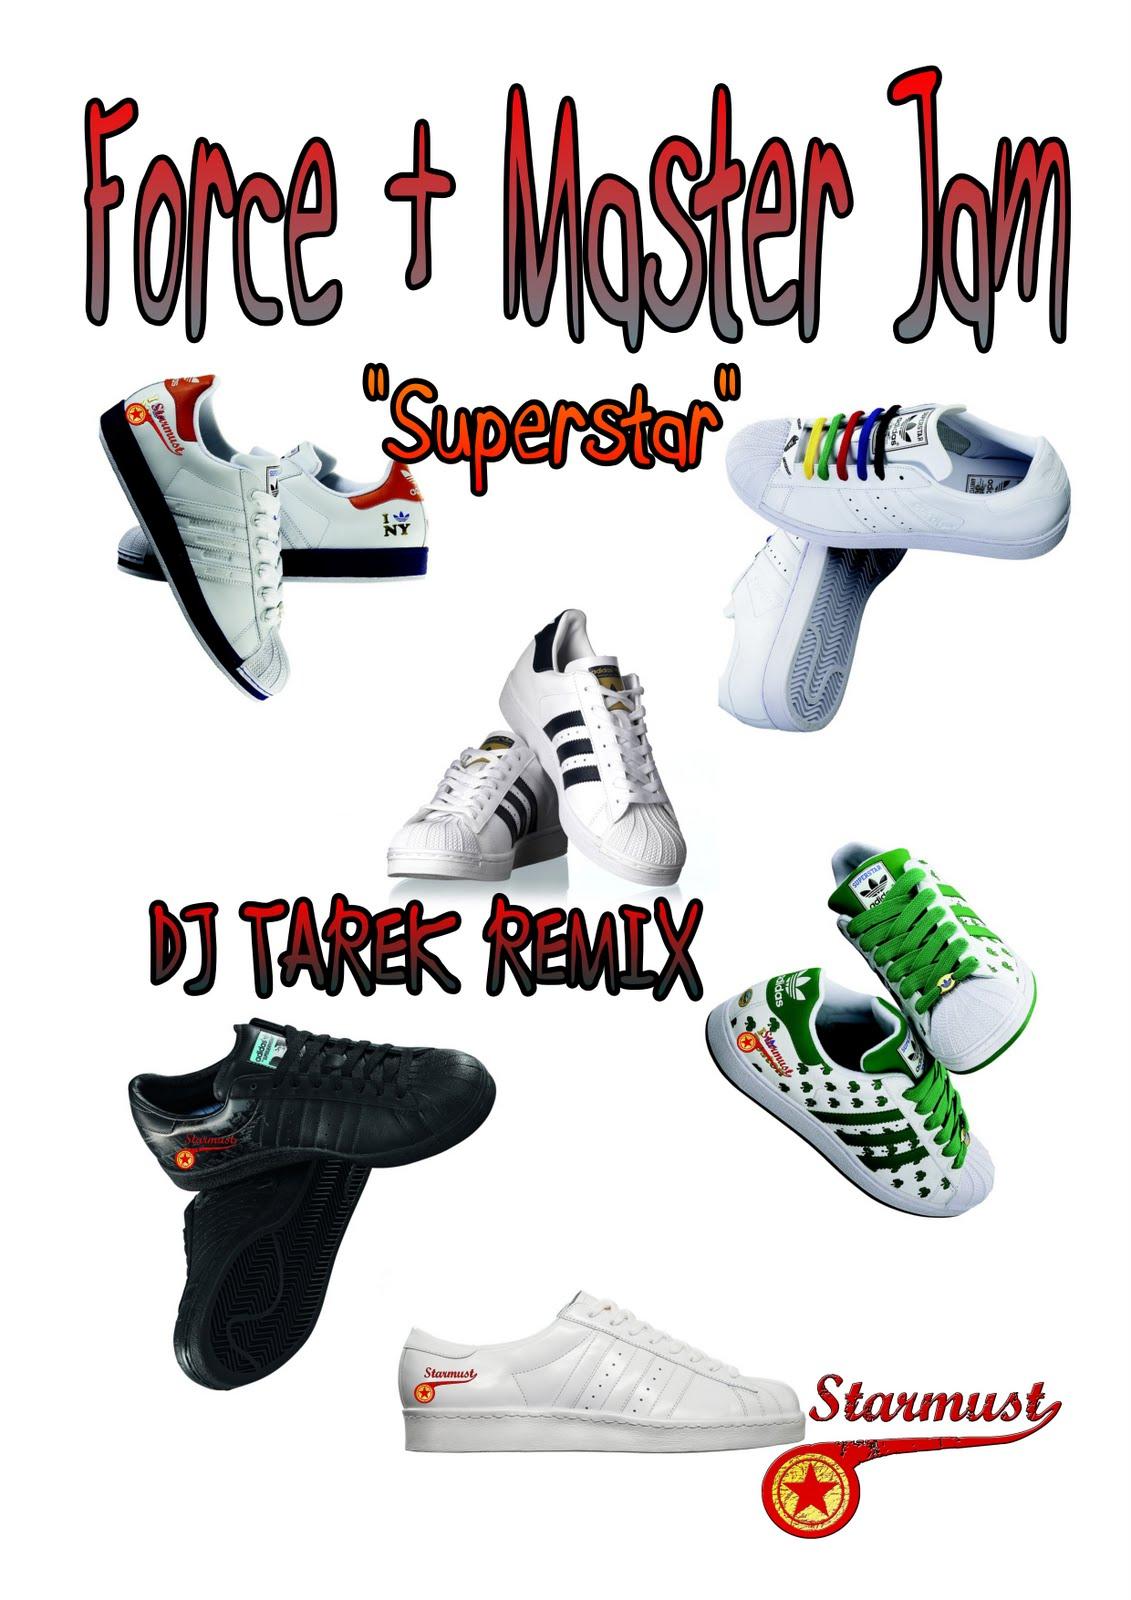 FORCE AND MASTER superstar DJ TAREK RMX  Page_1